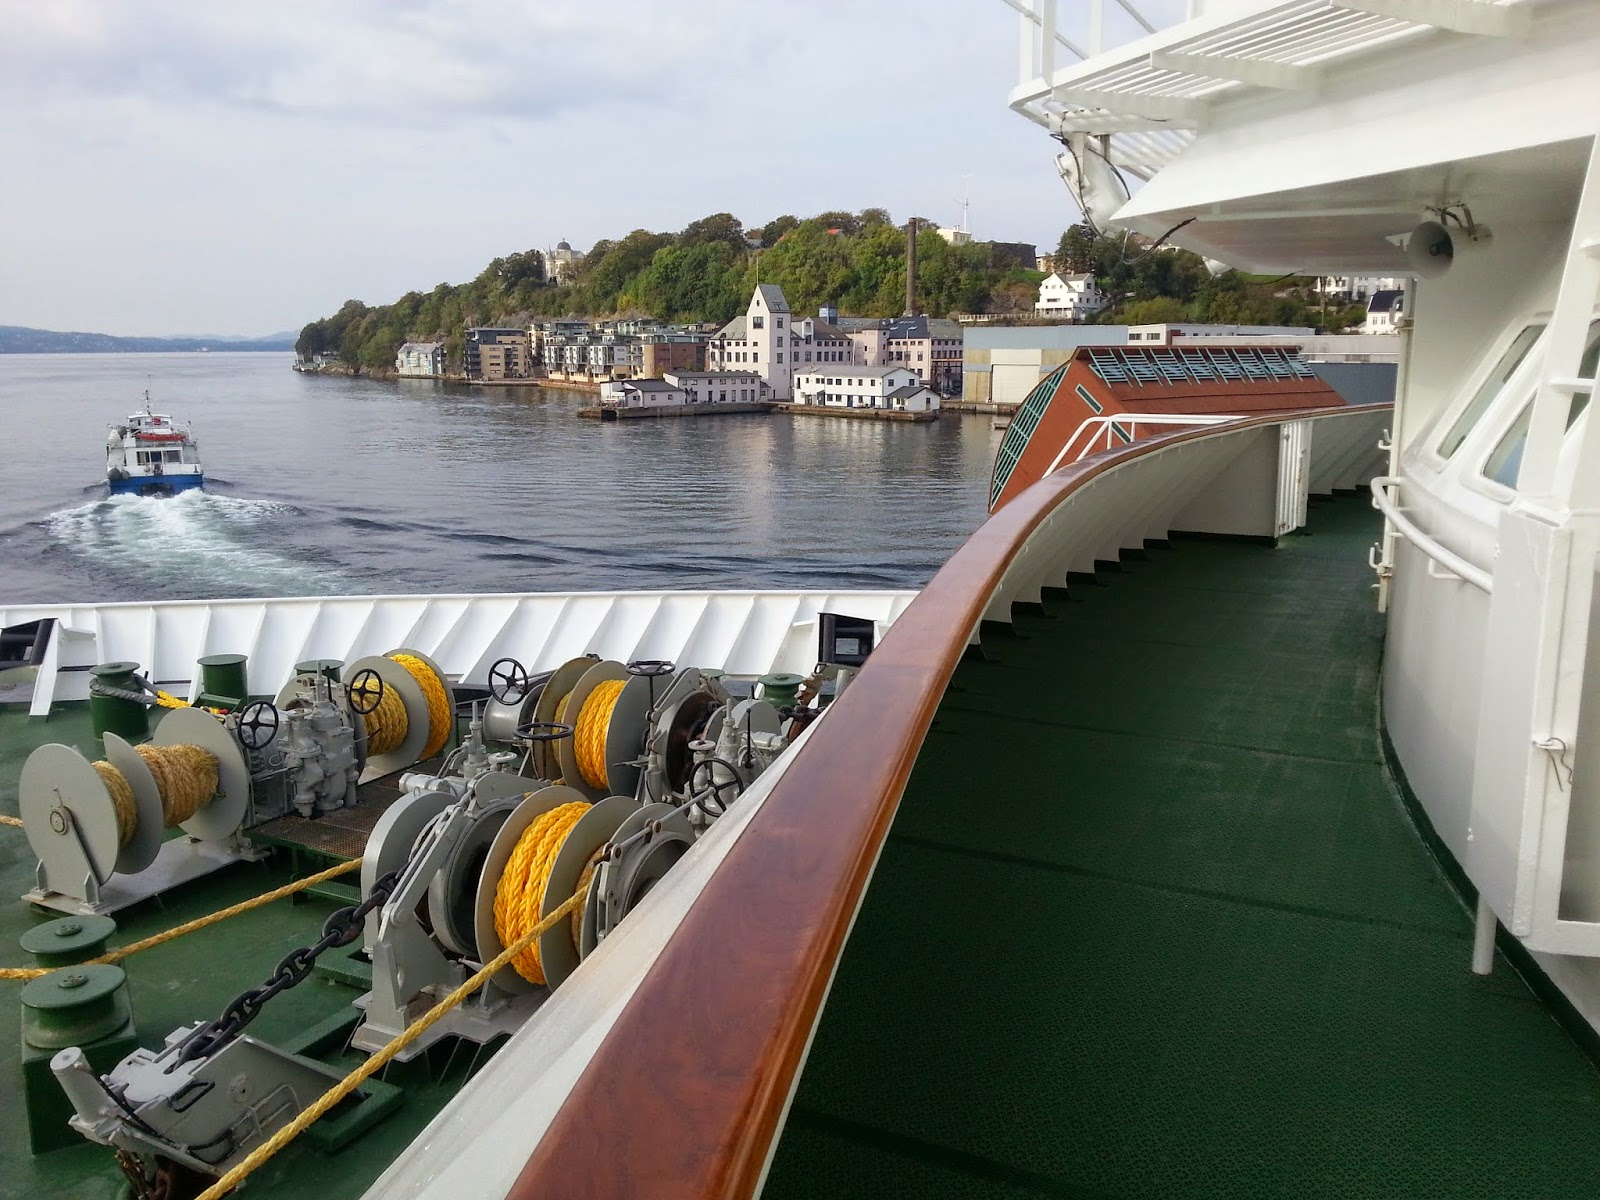 Hurtigruten MS Nordkapp - Promenade Deck and Bow